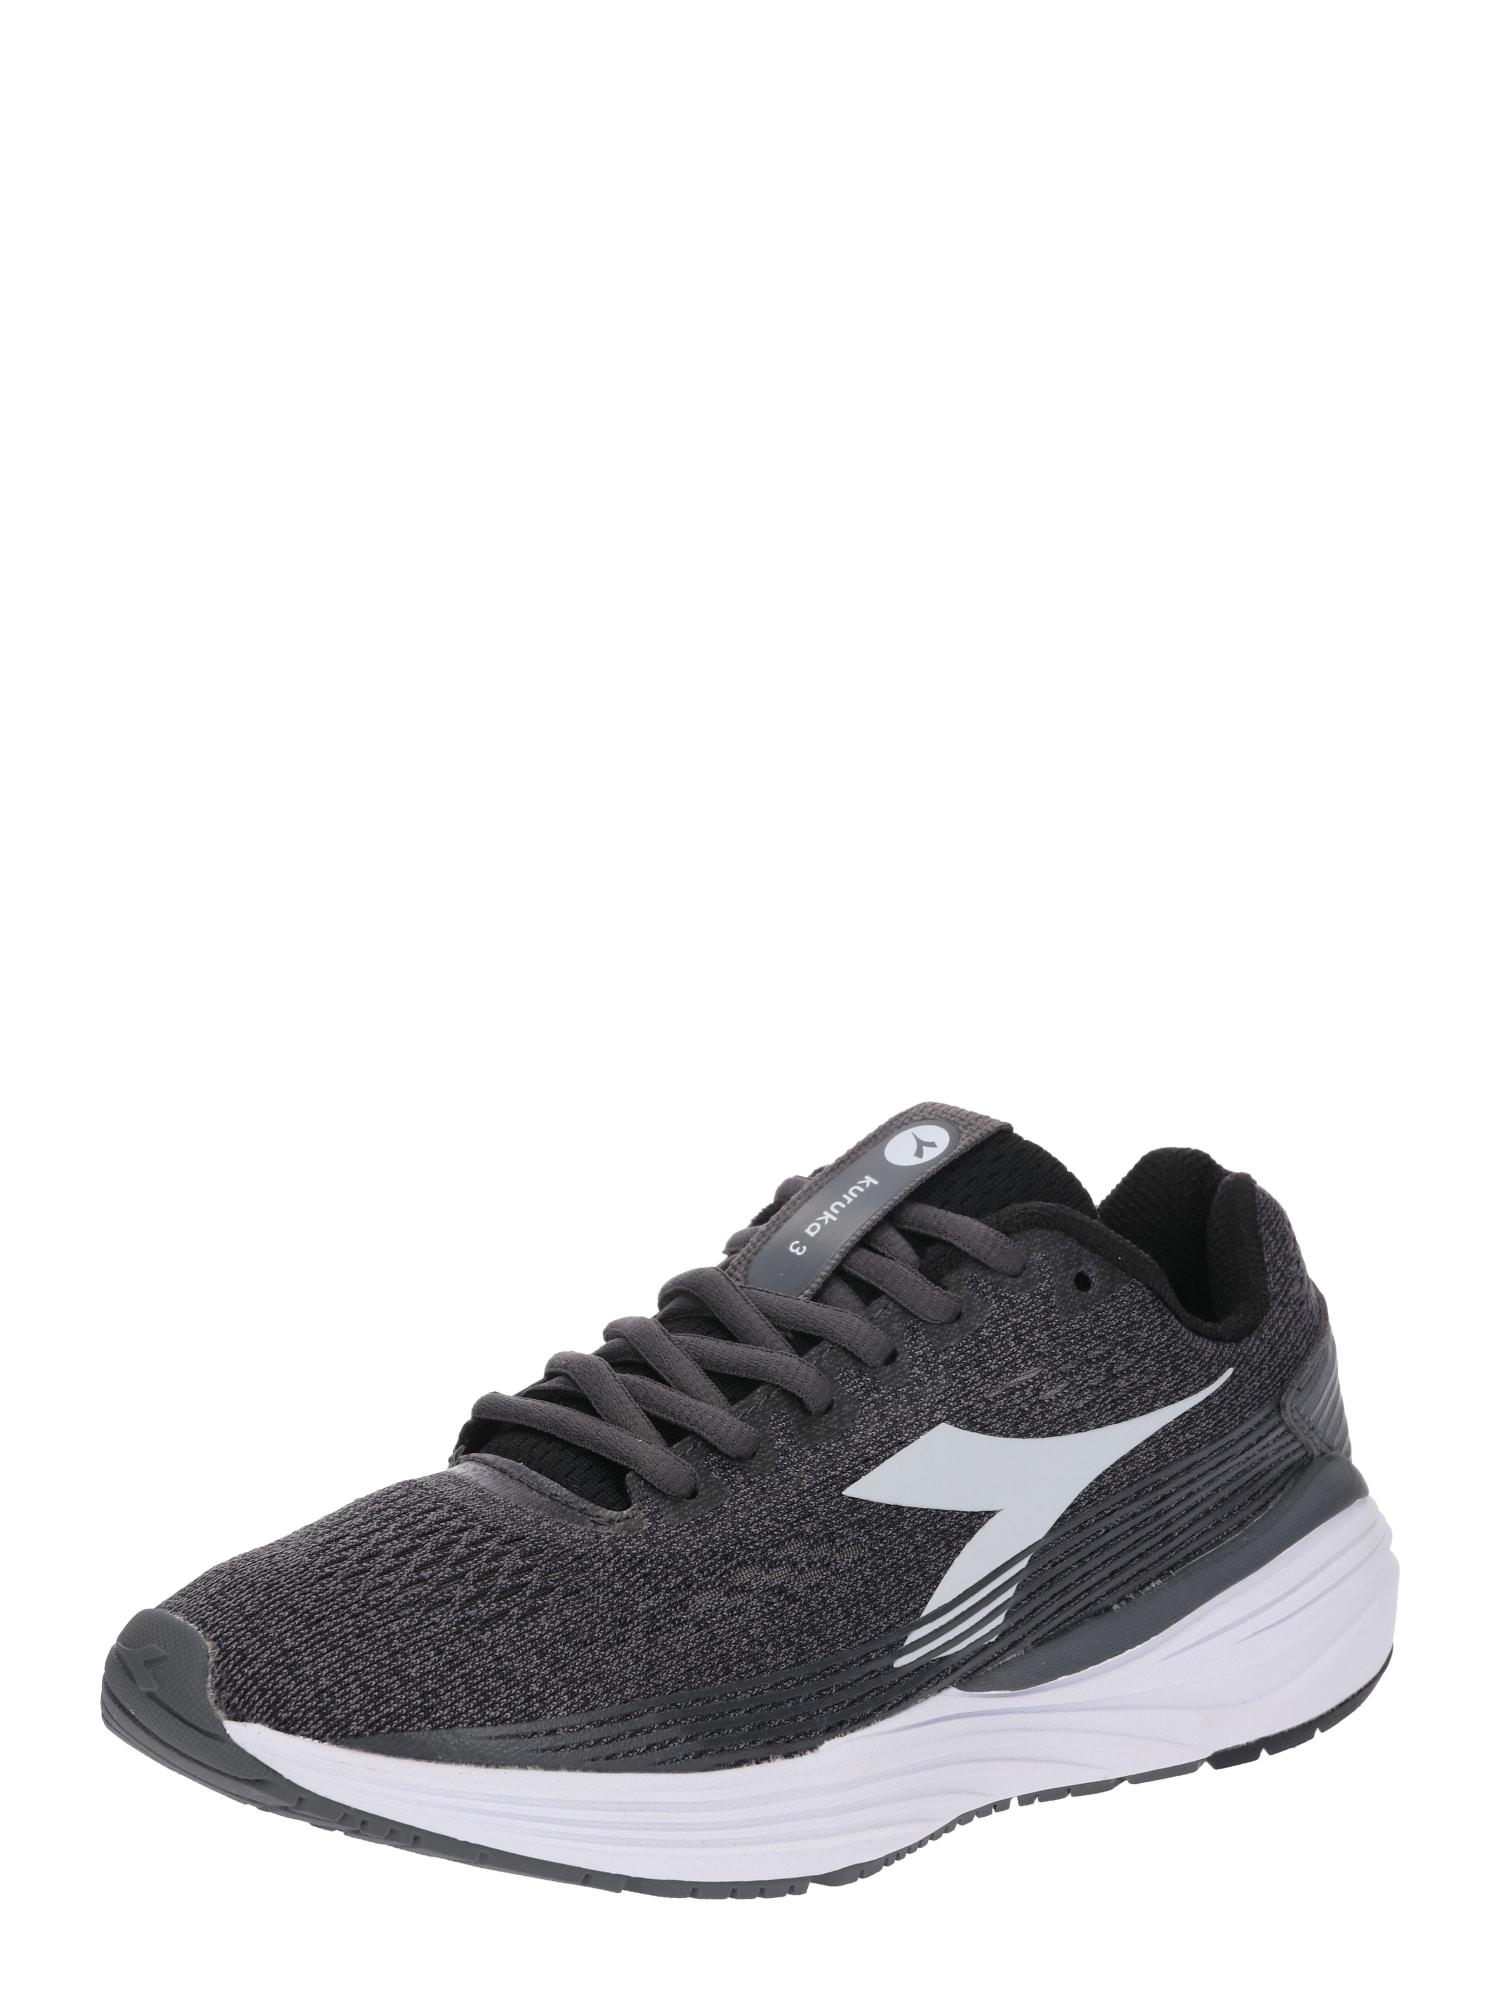 Běžecká obuv Kuruka šedá černá bílá Diadora